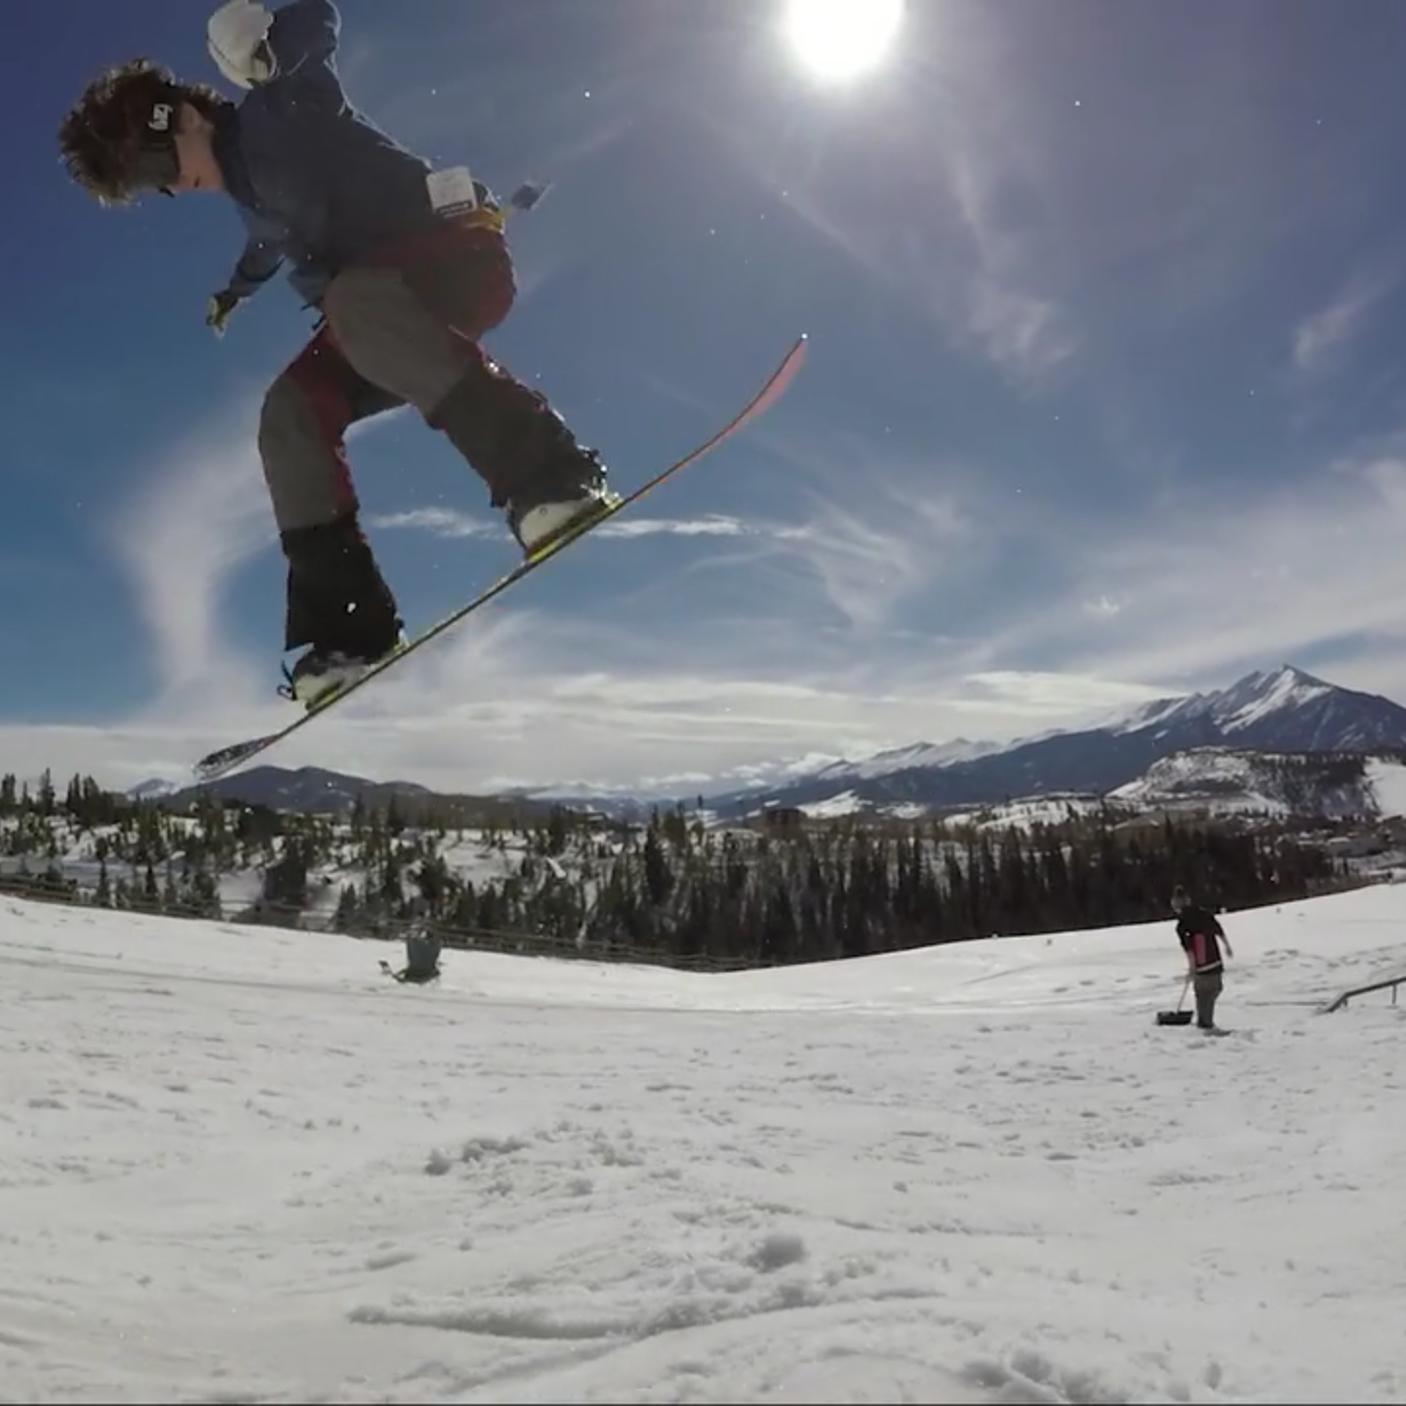 REDu0027S BACKYARD WITH THE CSU SNOWBOARD TEAM U2014 Snowboard Colorado Magazine